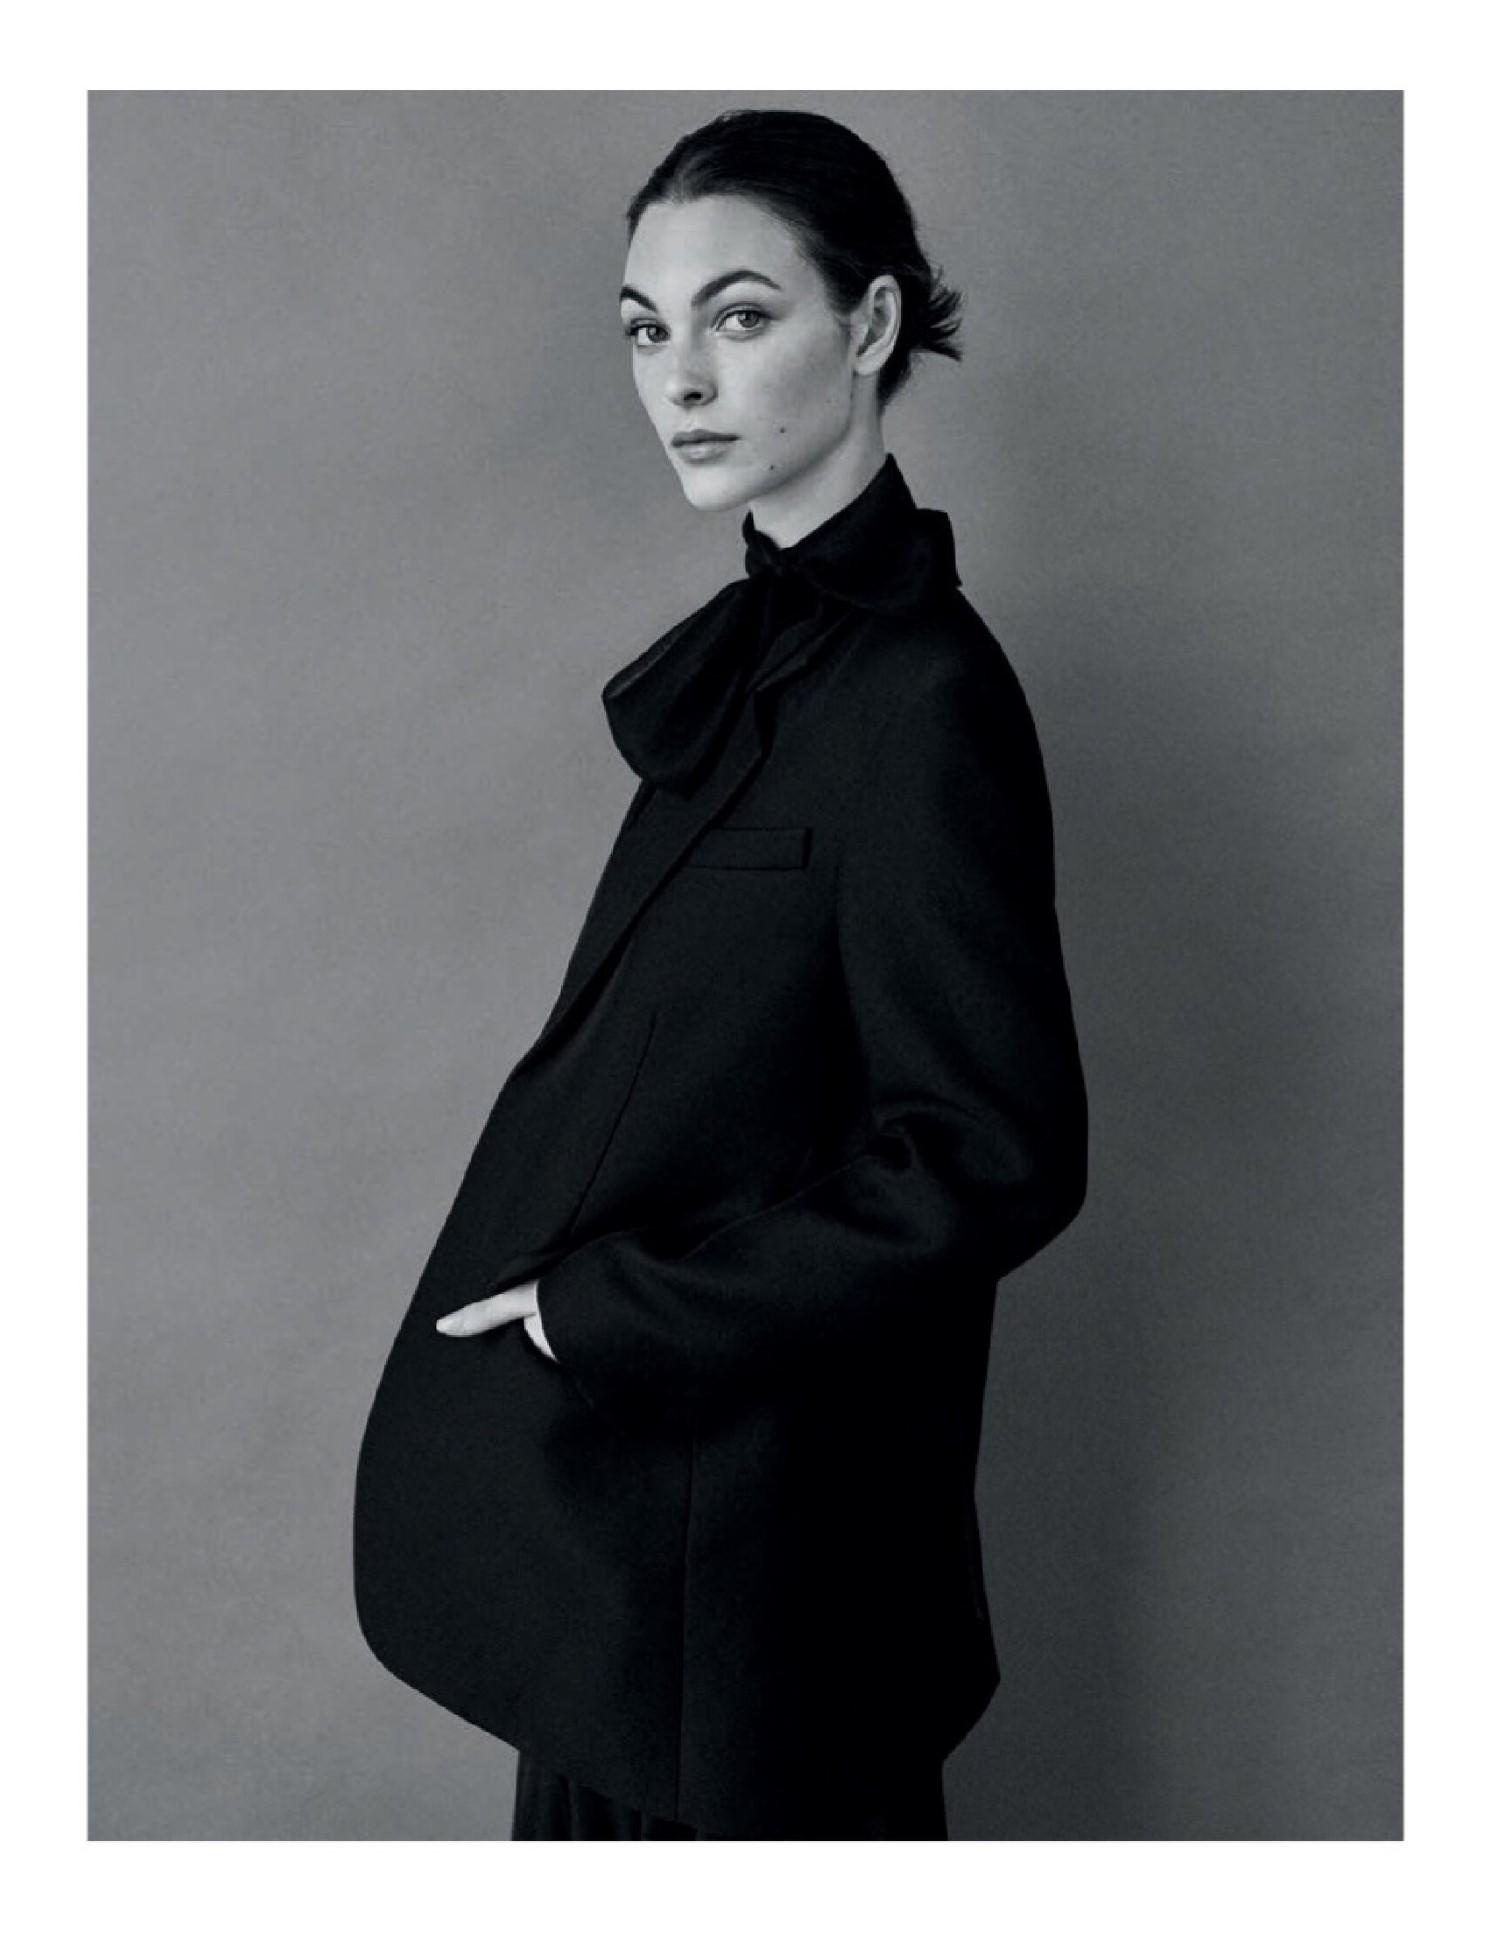 Vittoria Ceretti by Giampaolo Sgura for Vogue Paris Sept 2019 (15).jpg